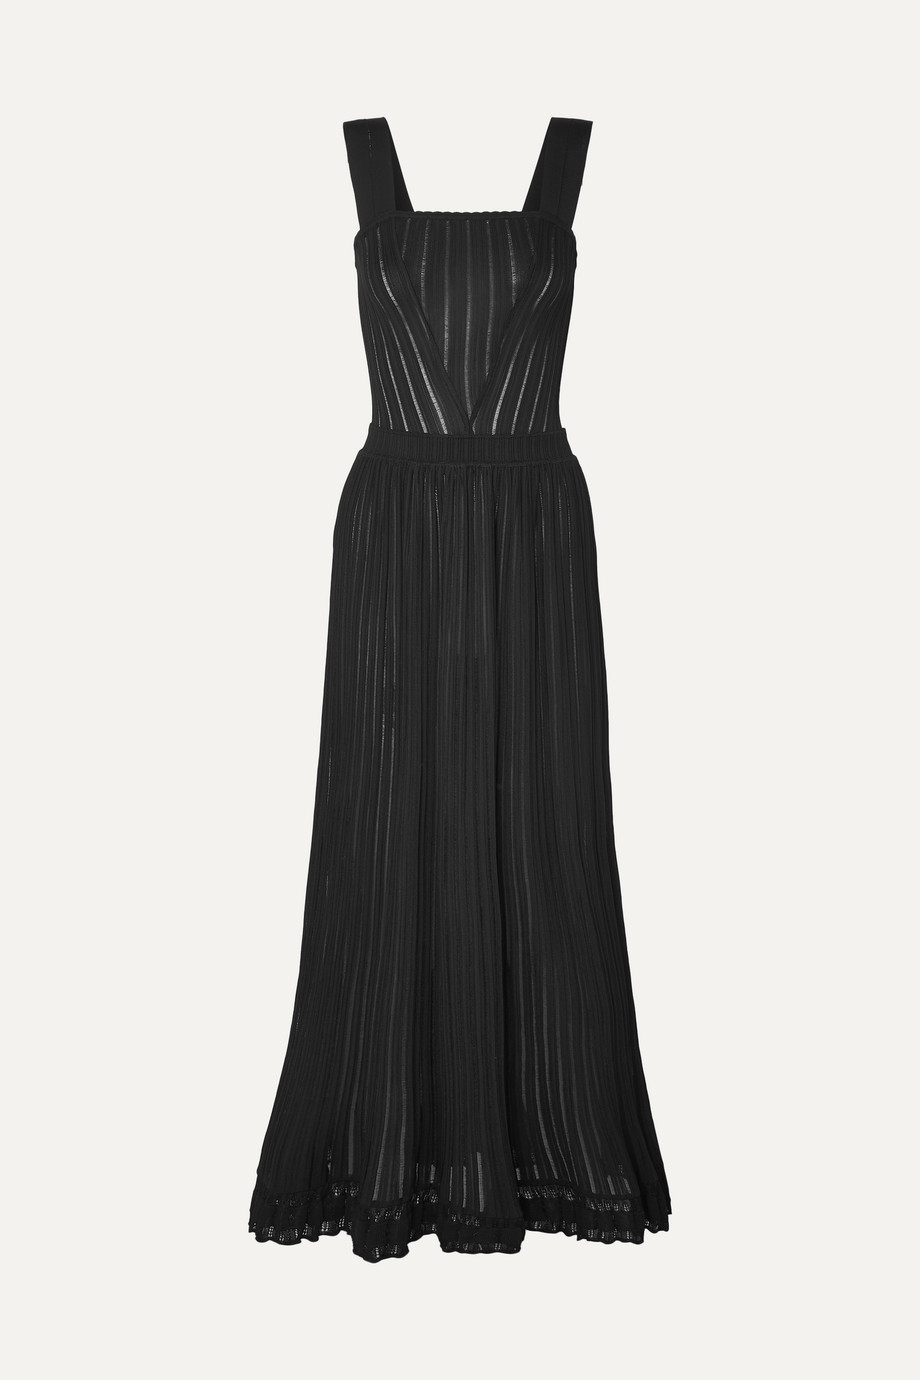 Alaïa Ribbed stretch-knit maxi dress